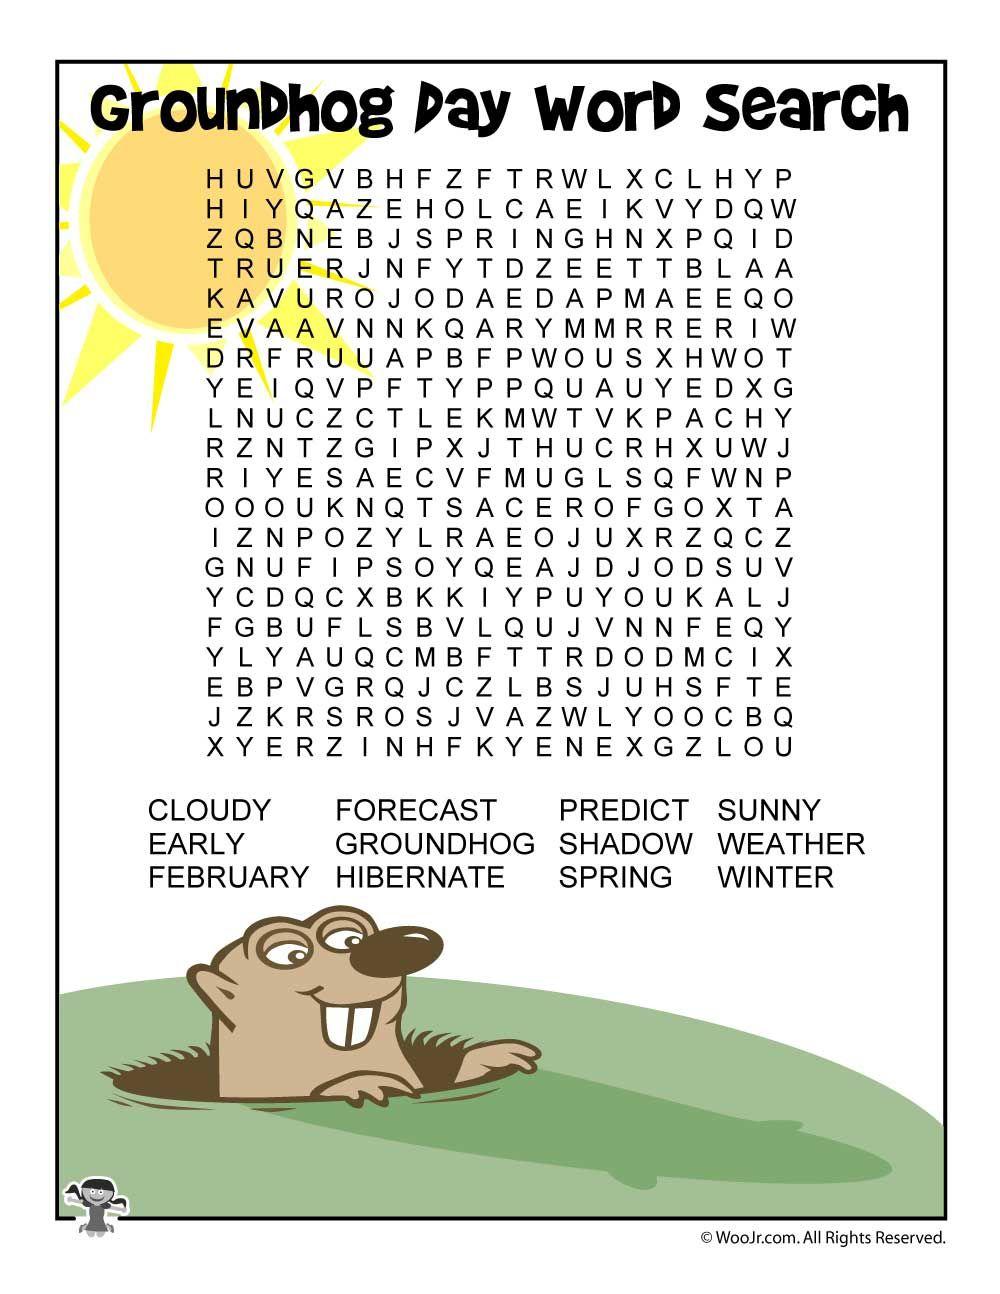 Groundhog Day Word Search | Groundhog Day, Groundhog Day